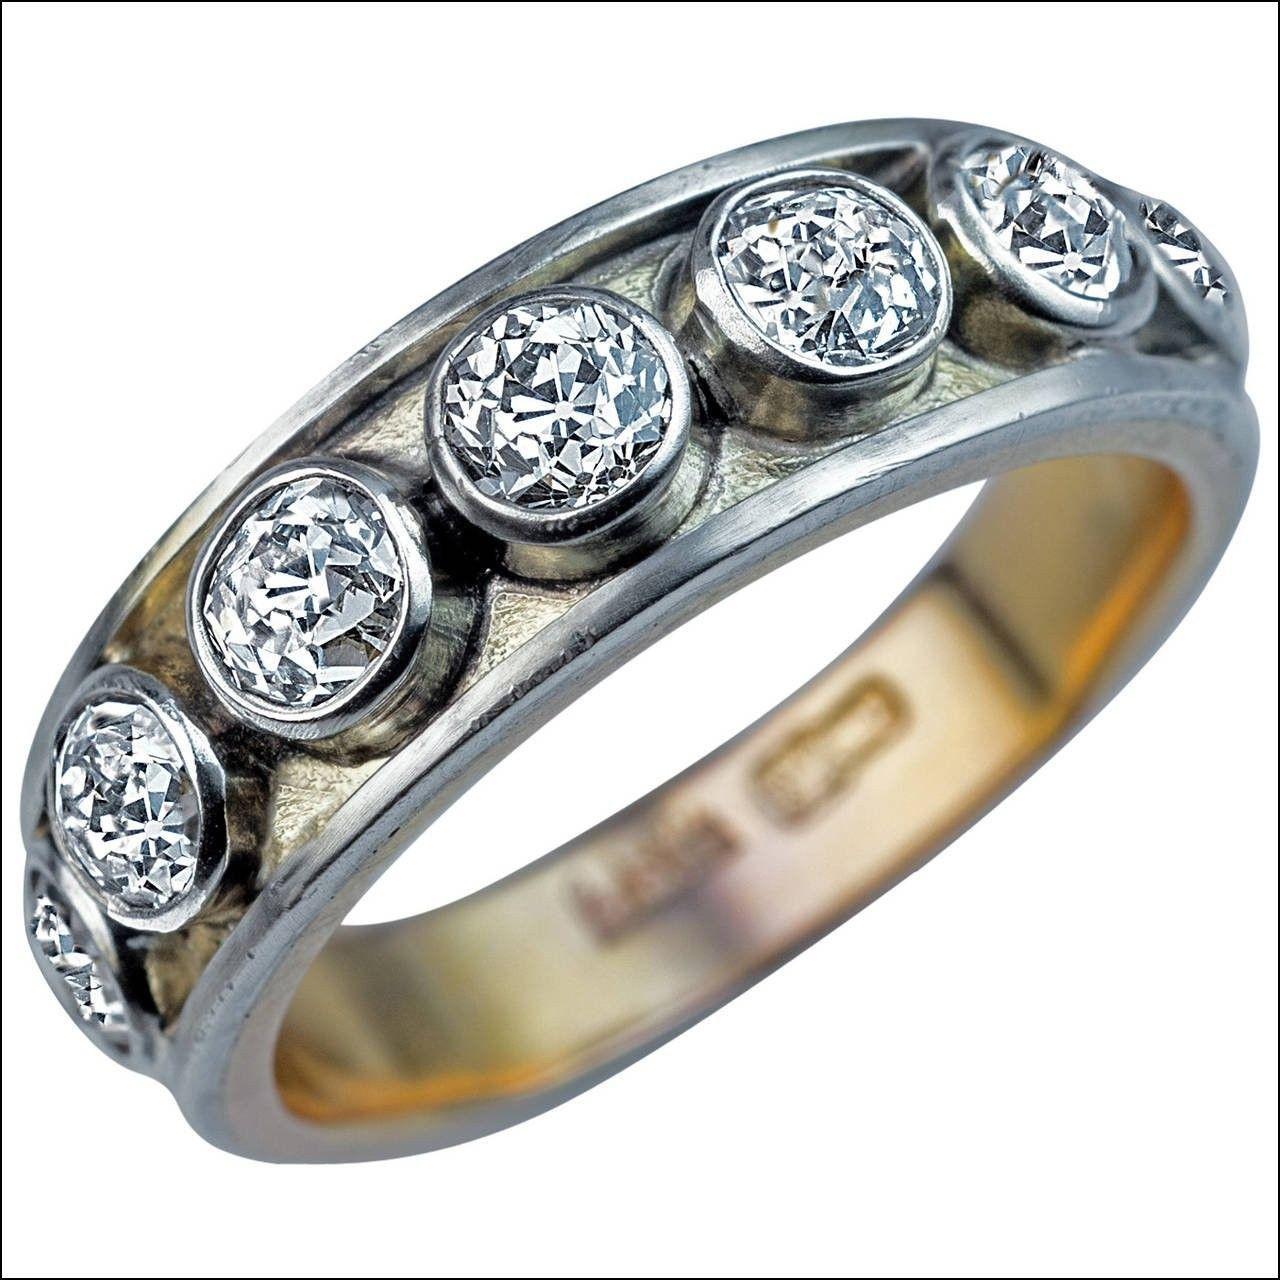 Russian Wedding Ring Tiffany Engagement Rings Tiffany Pinterest